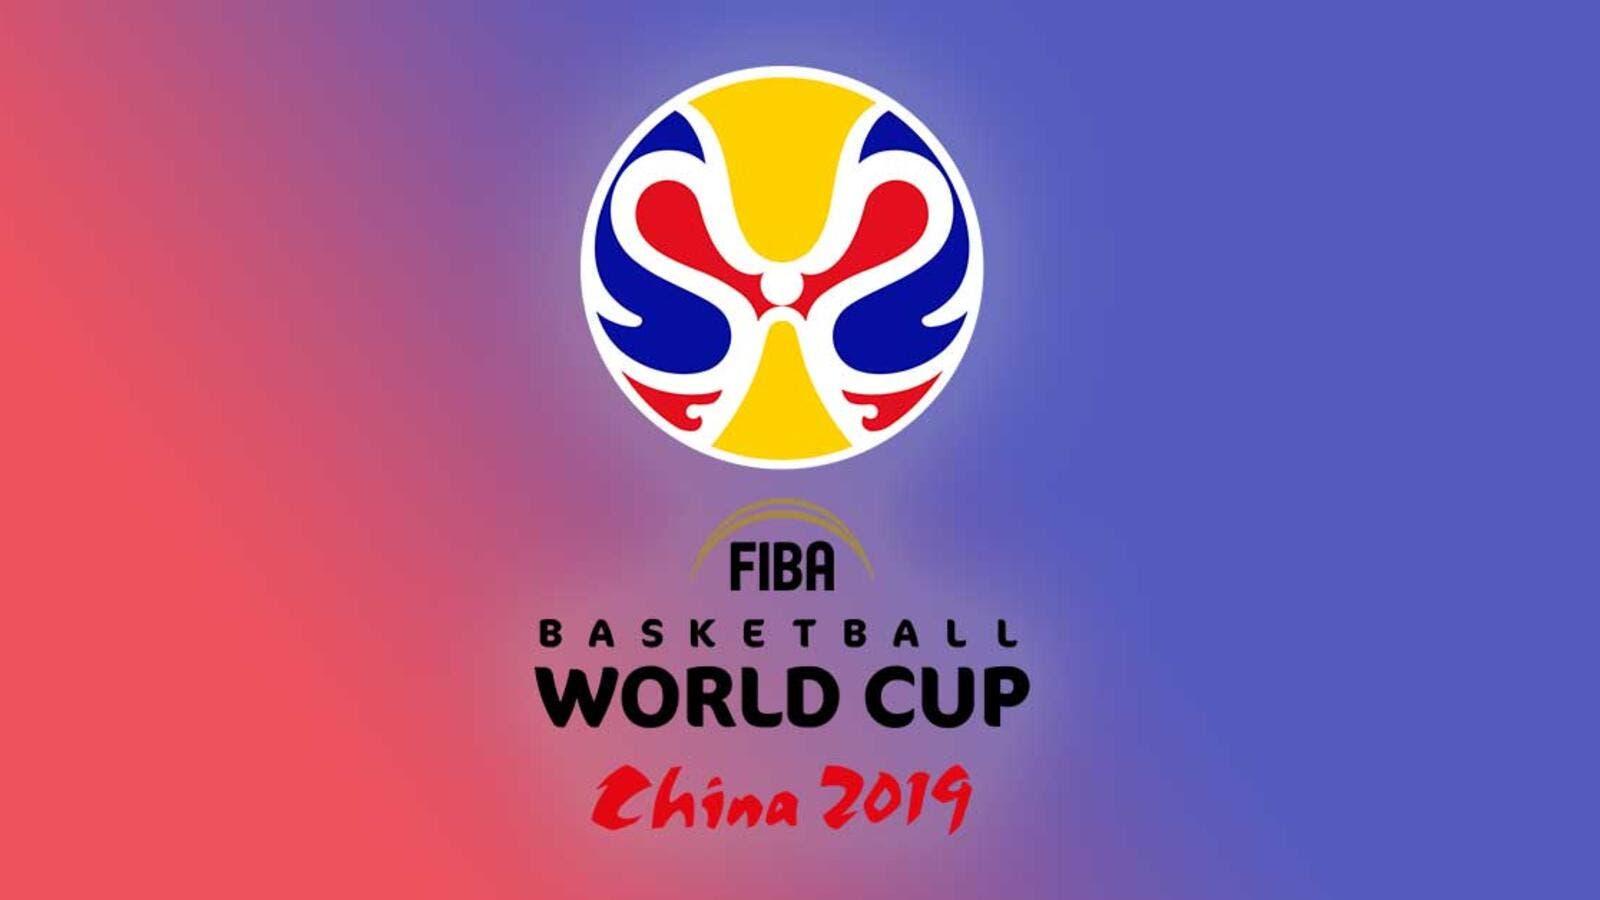 basketball world cup - photo #27